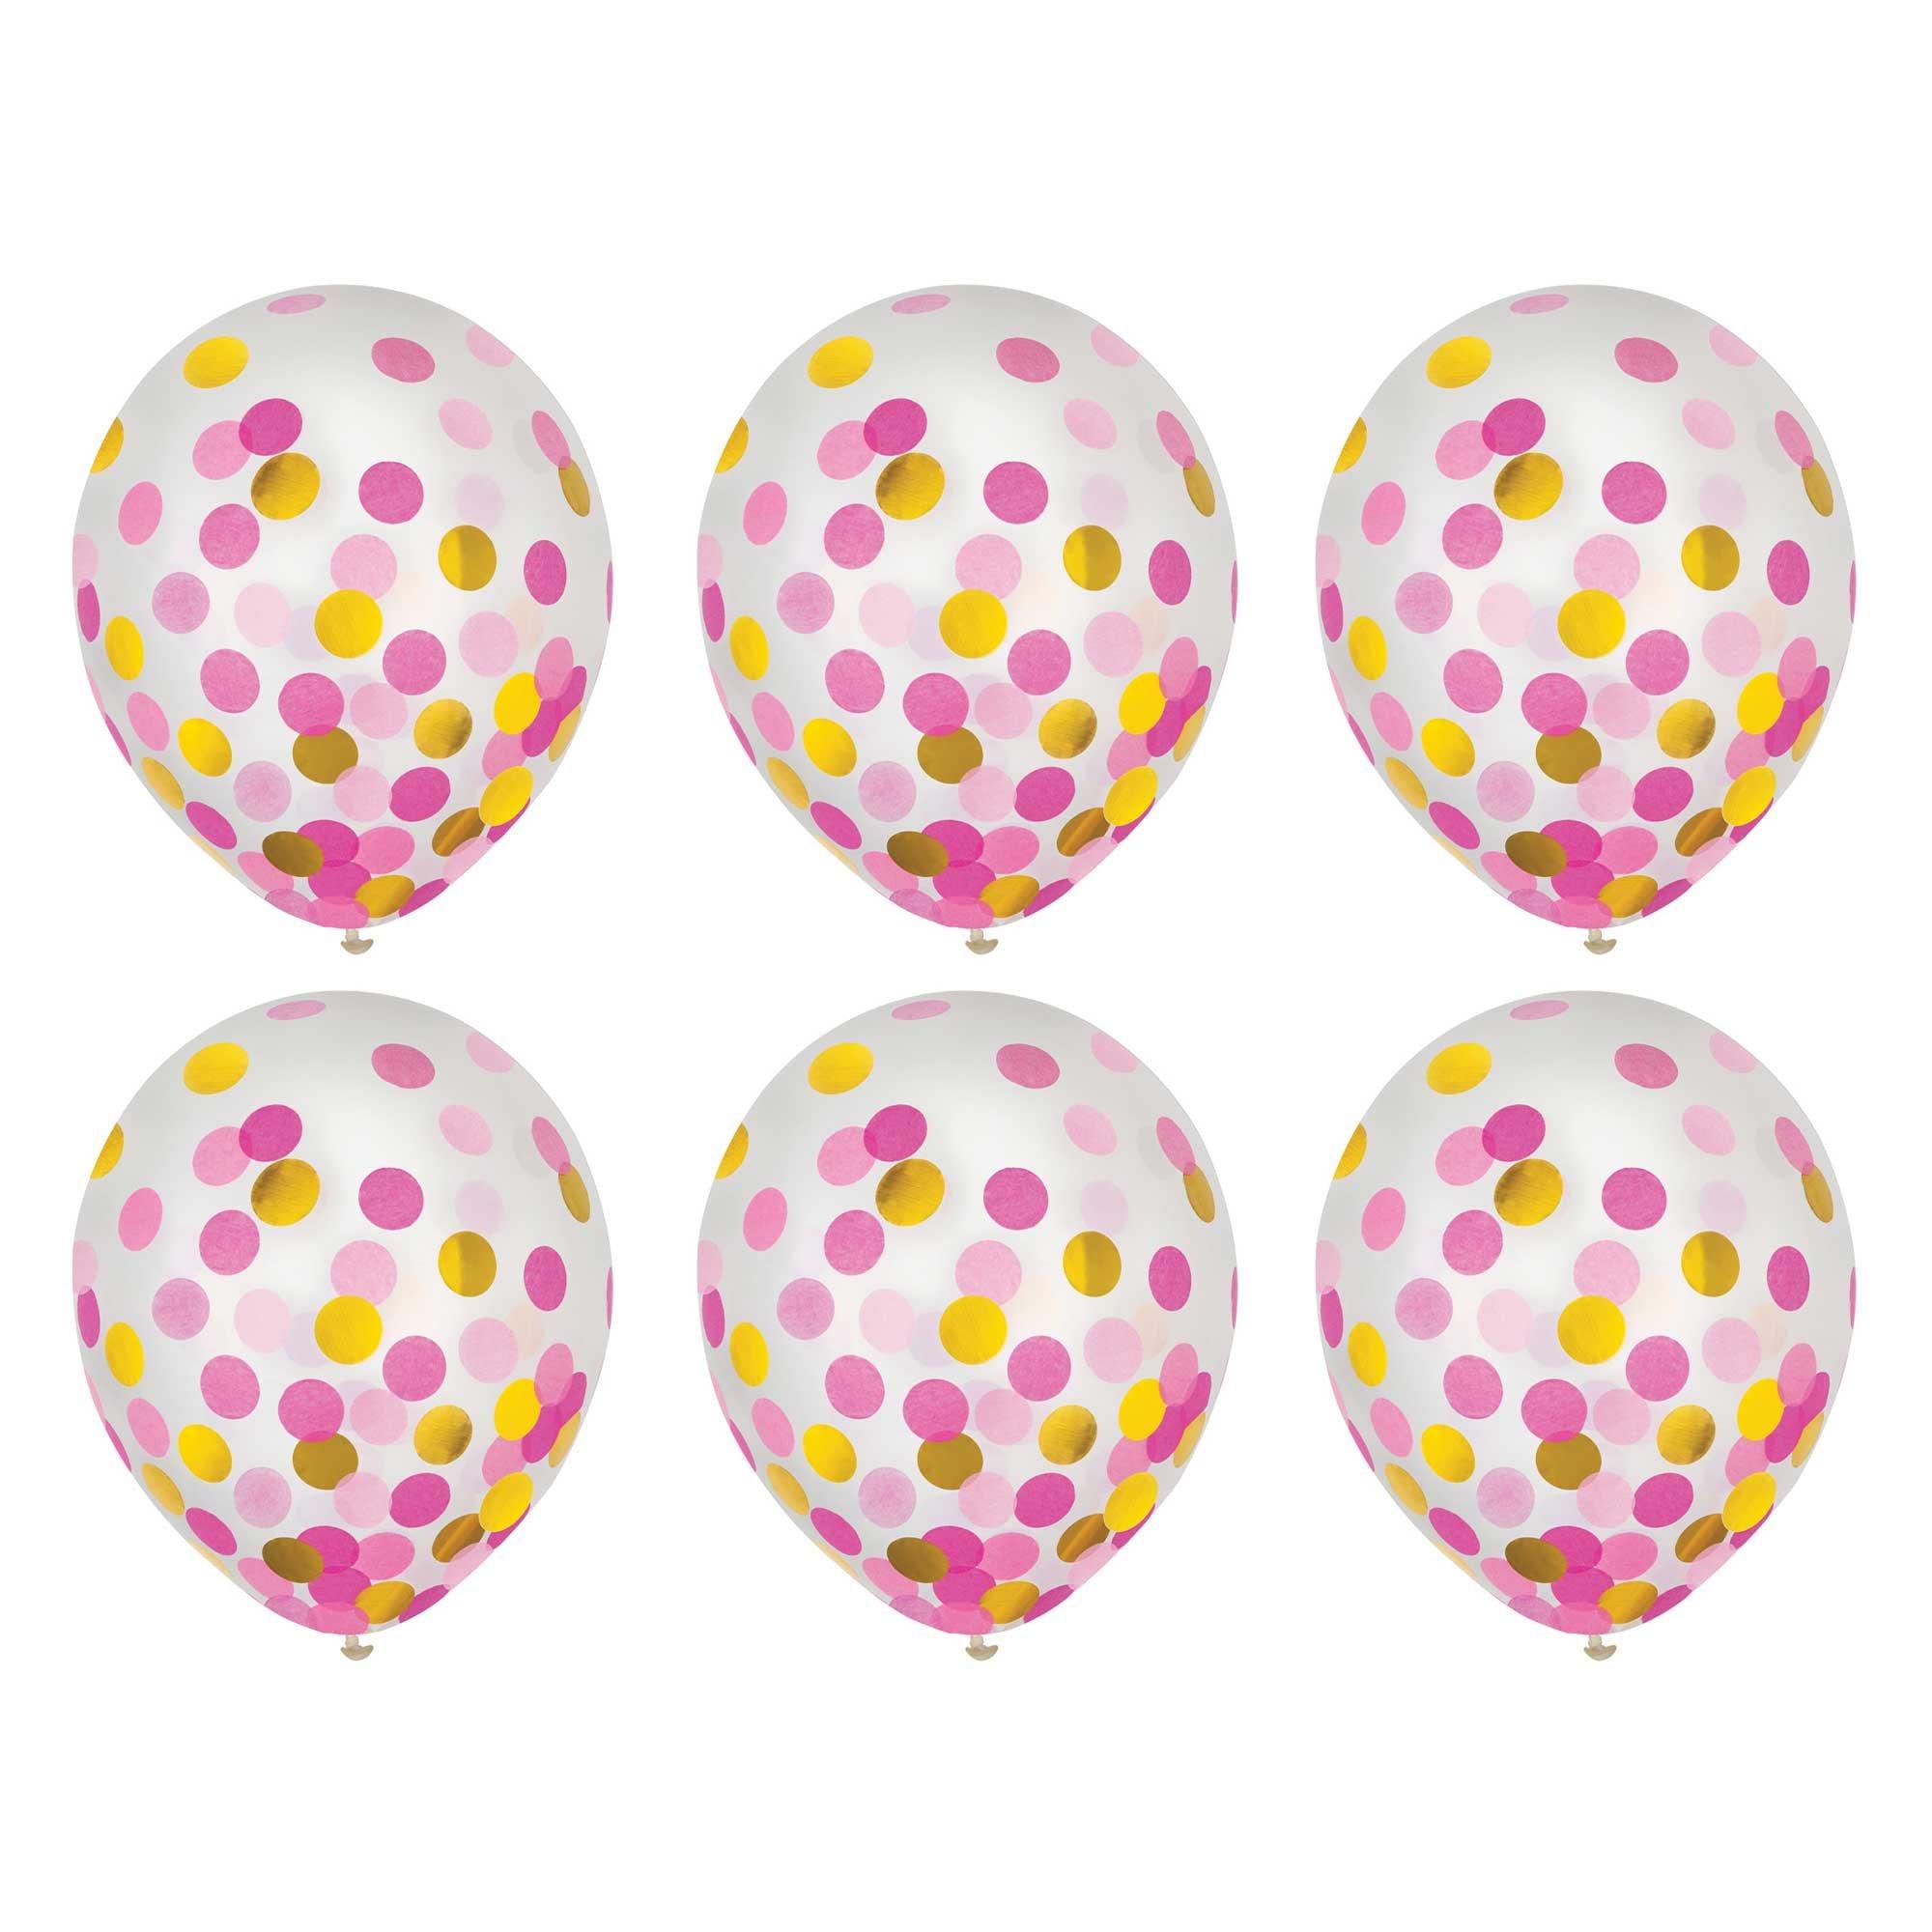 Latex Balloons 30cm & Confetti Pink & Gold